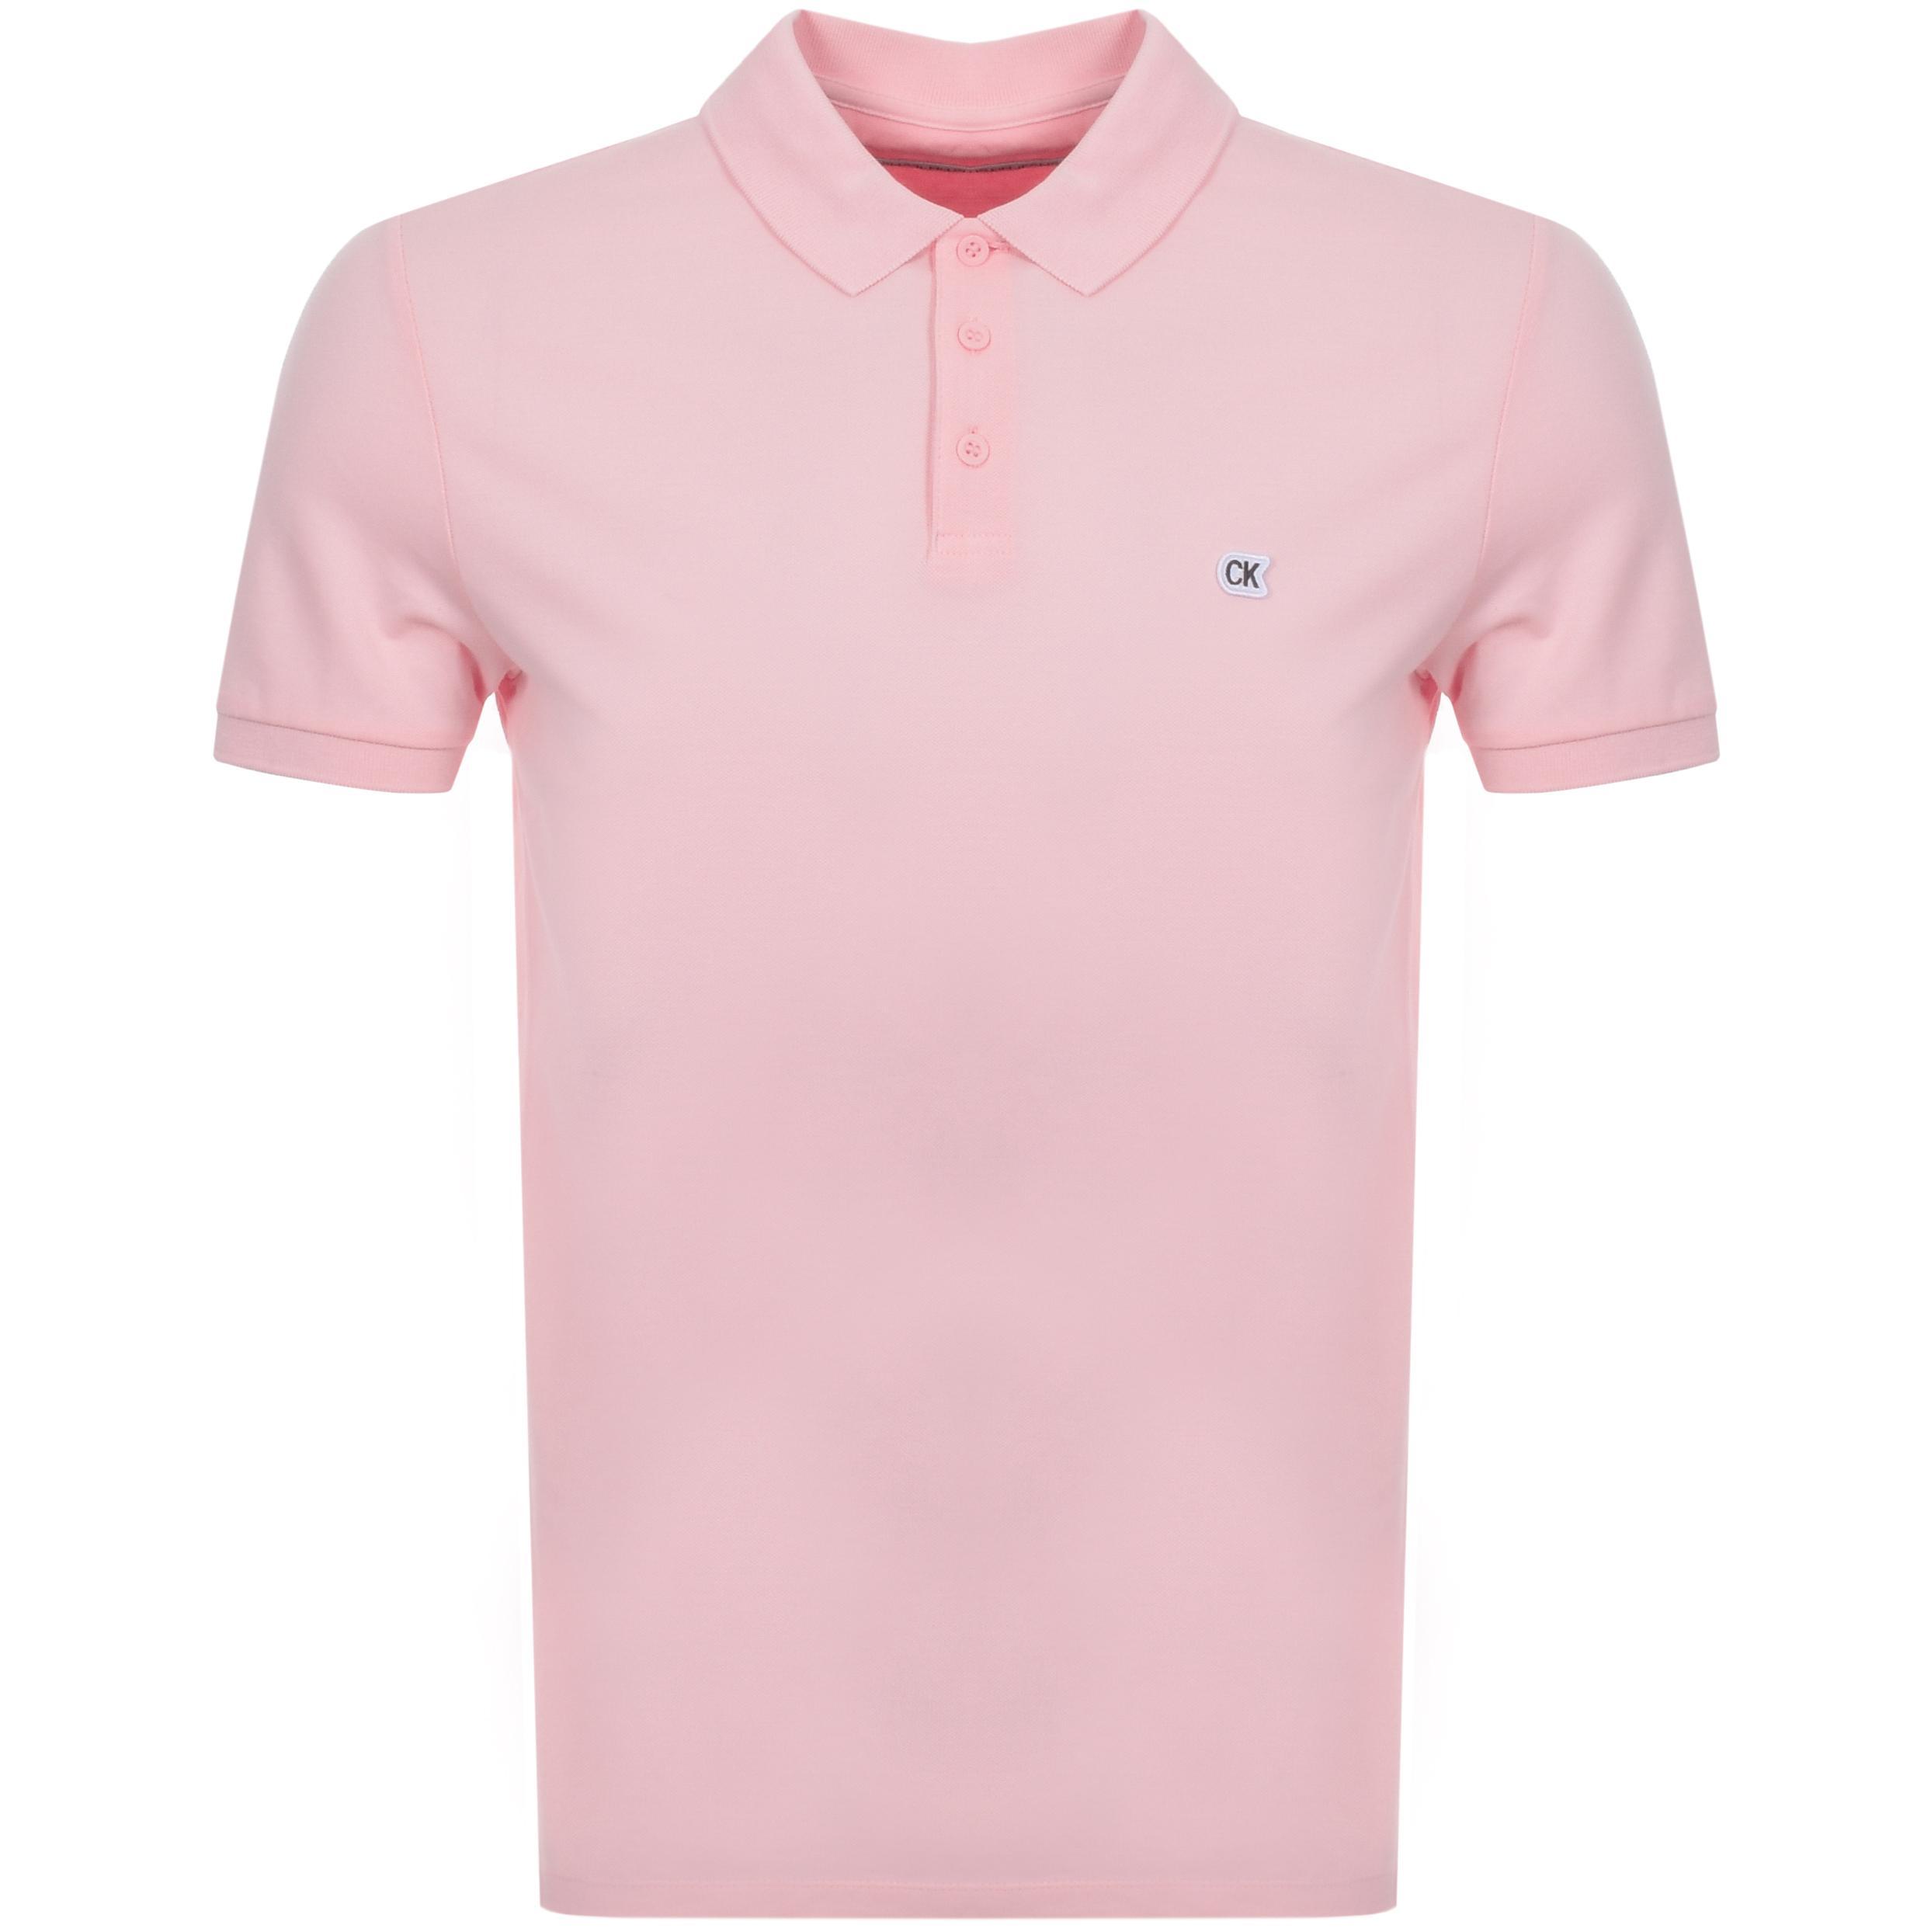 calvin klein pink shirt